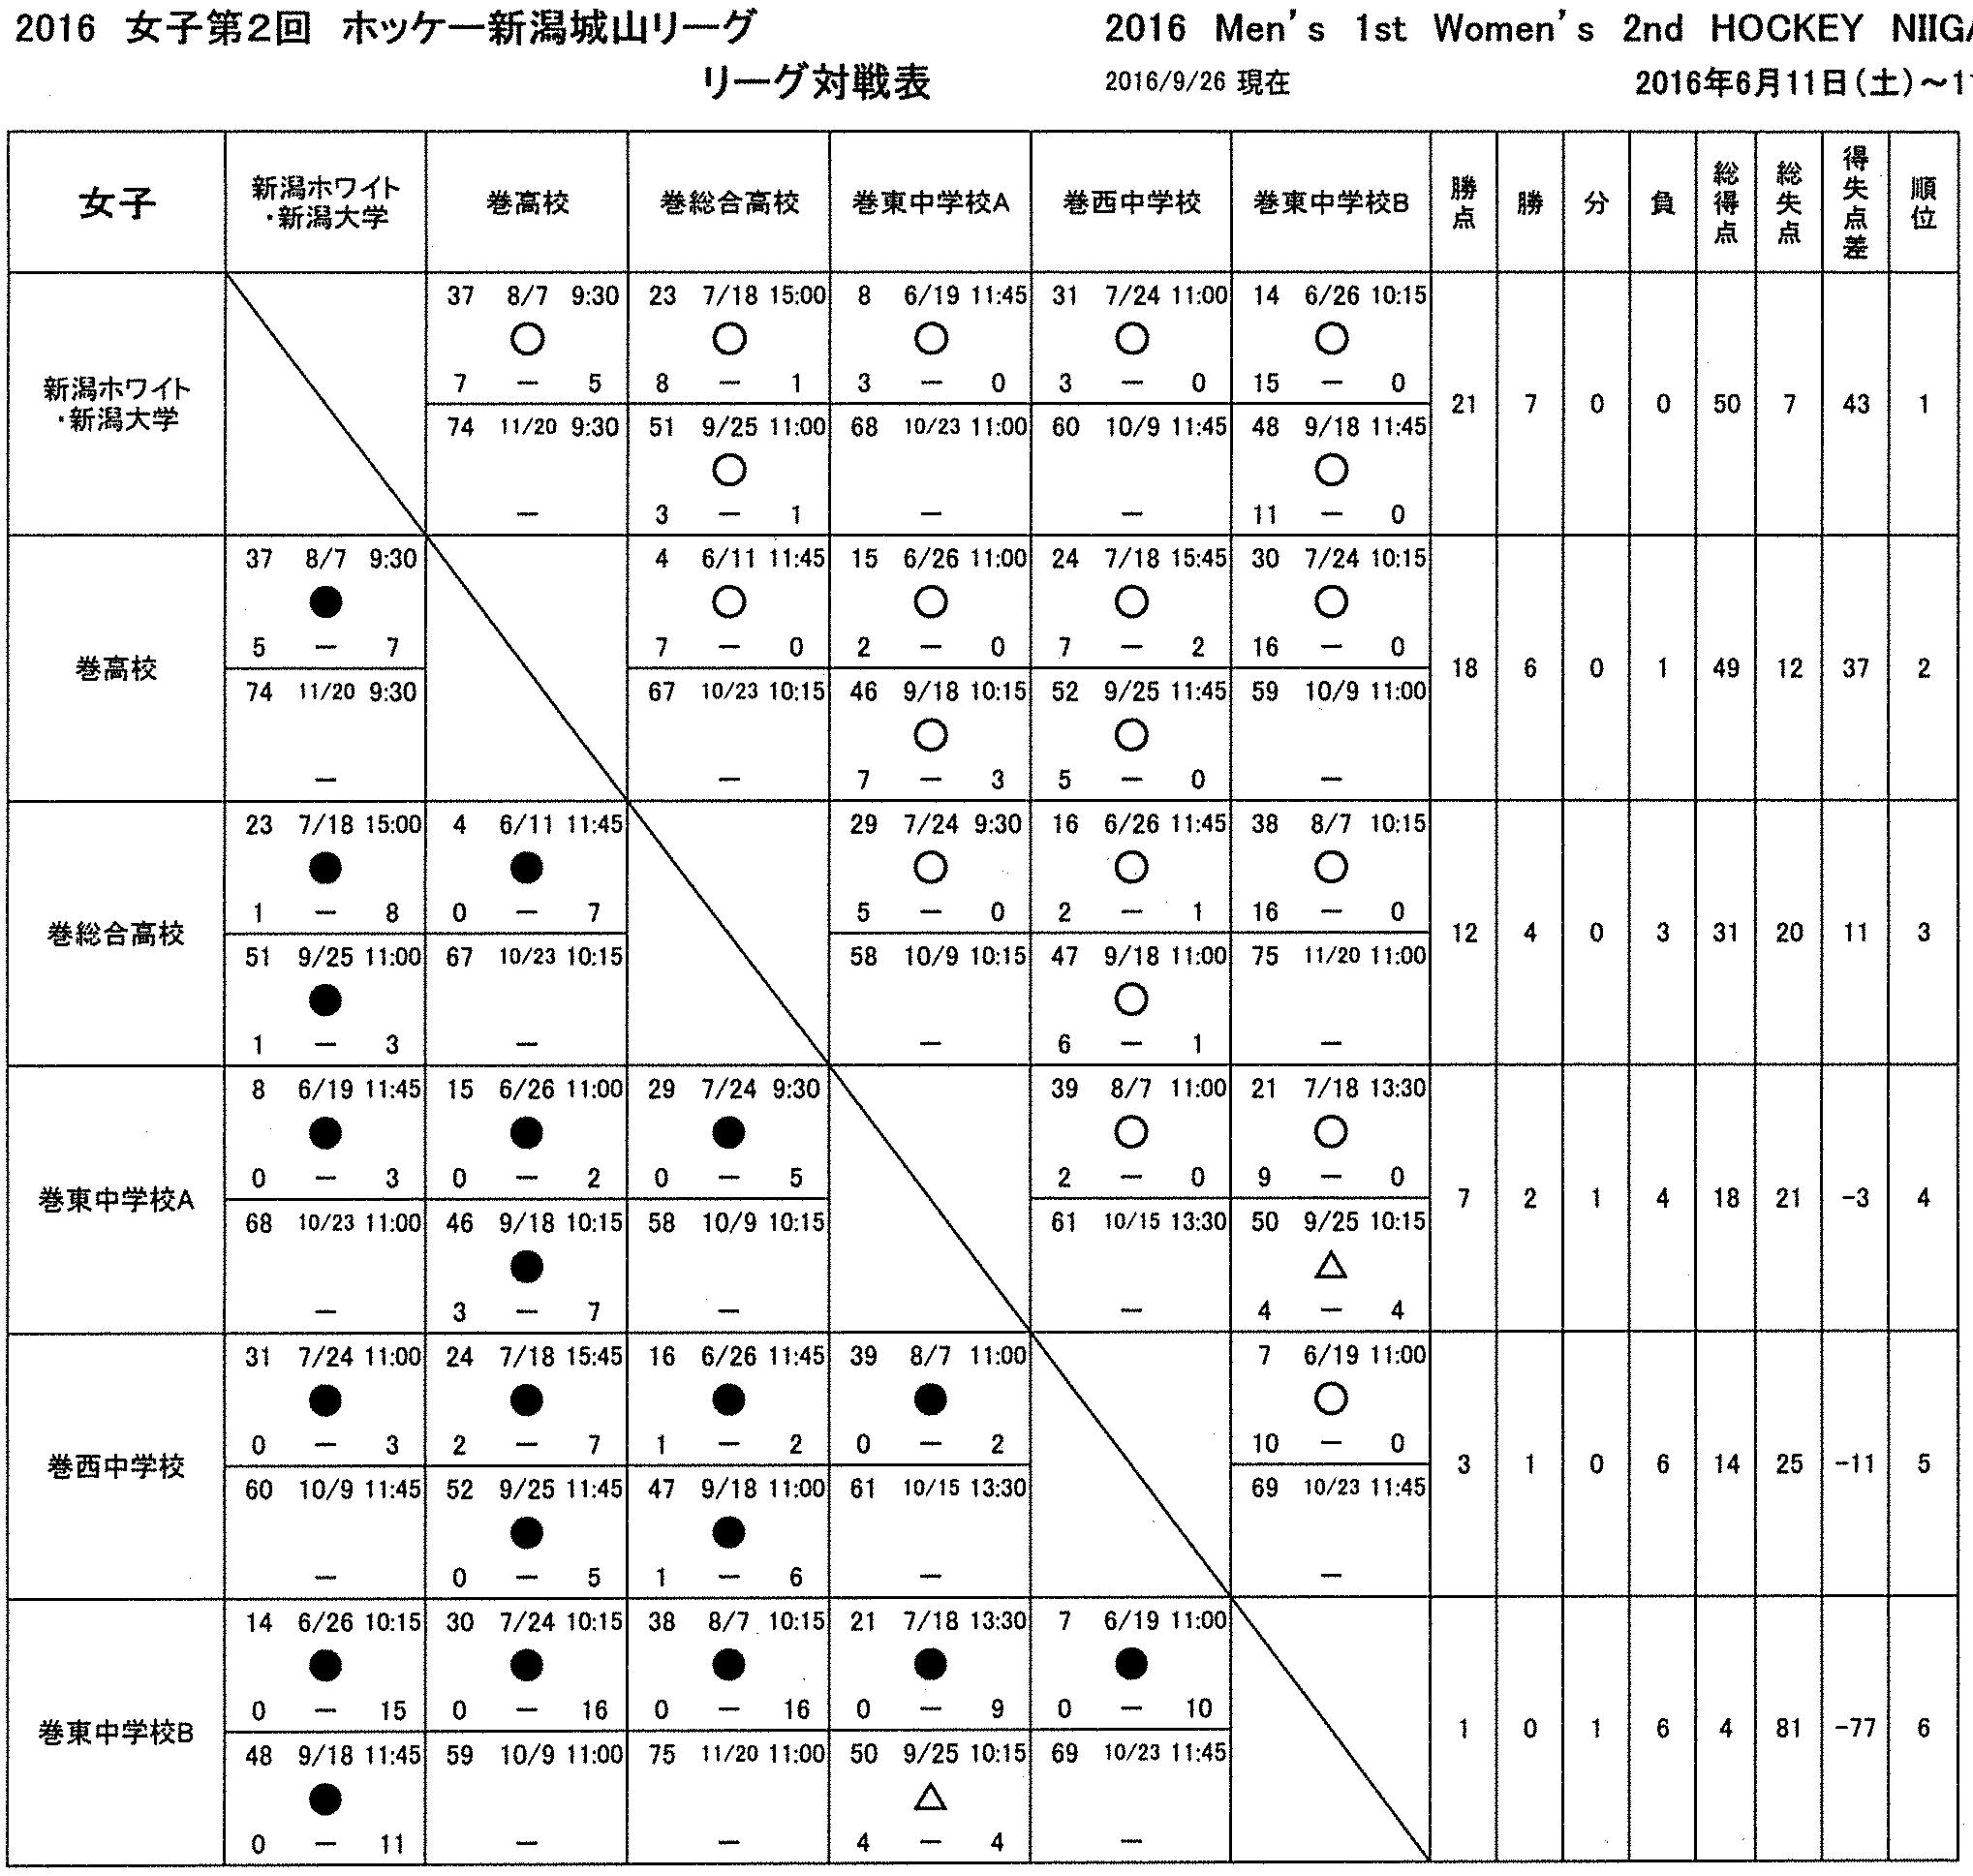 HNJL第8・9節結果 10・11節予定